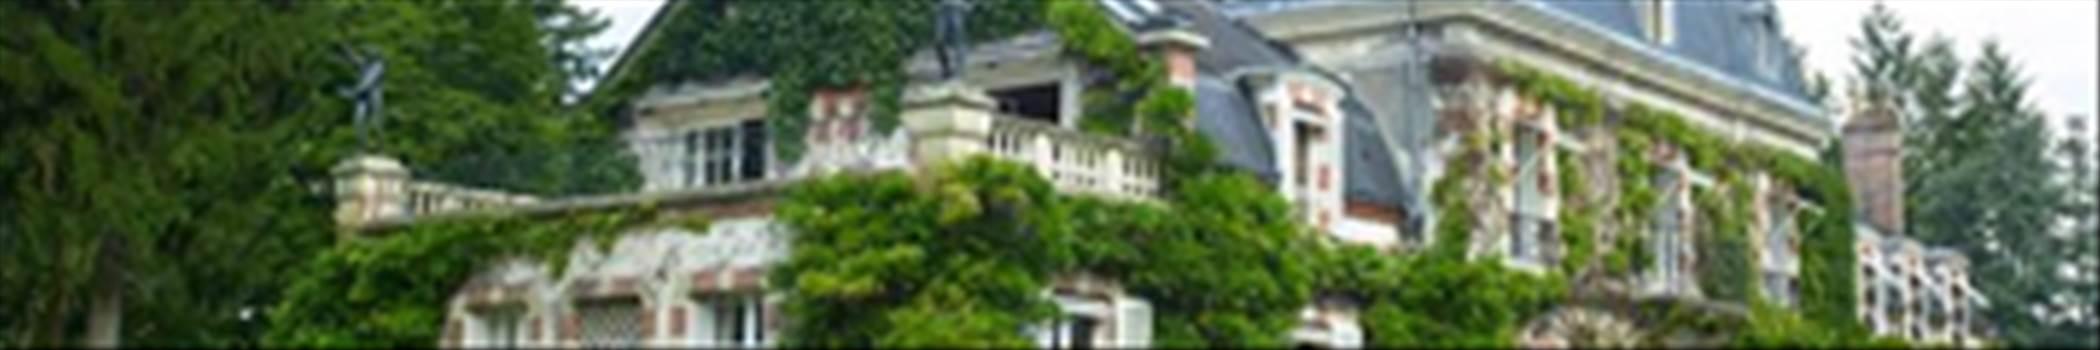 board-brierwell-estate.jpg by shoresofelysium